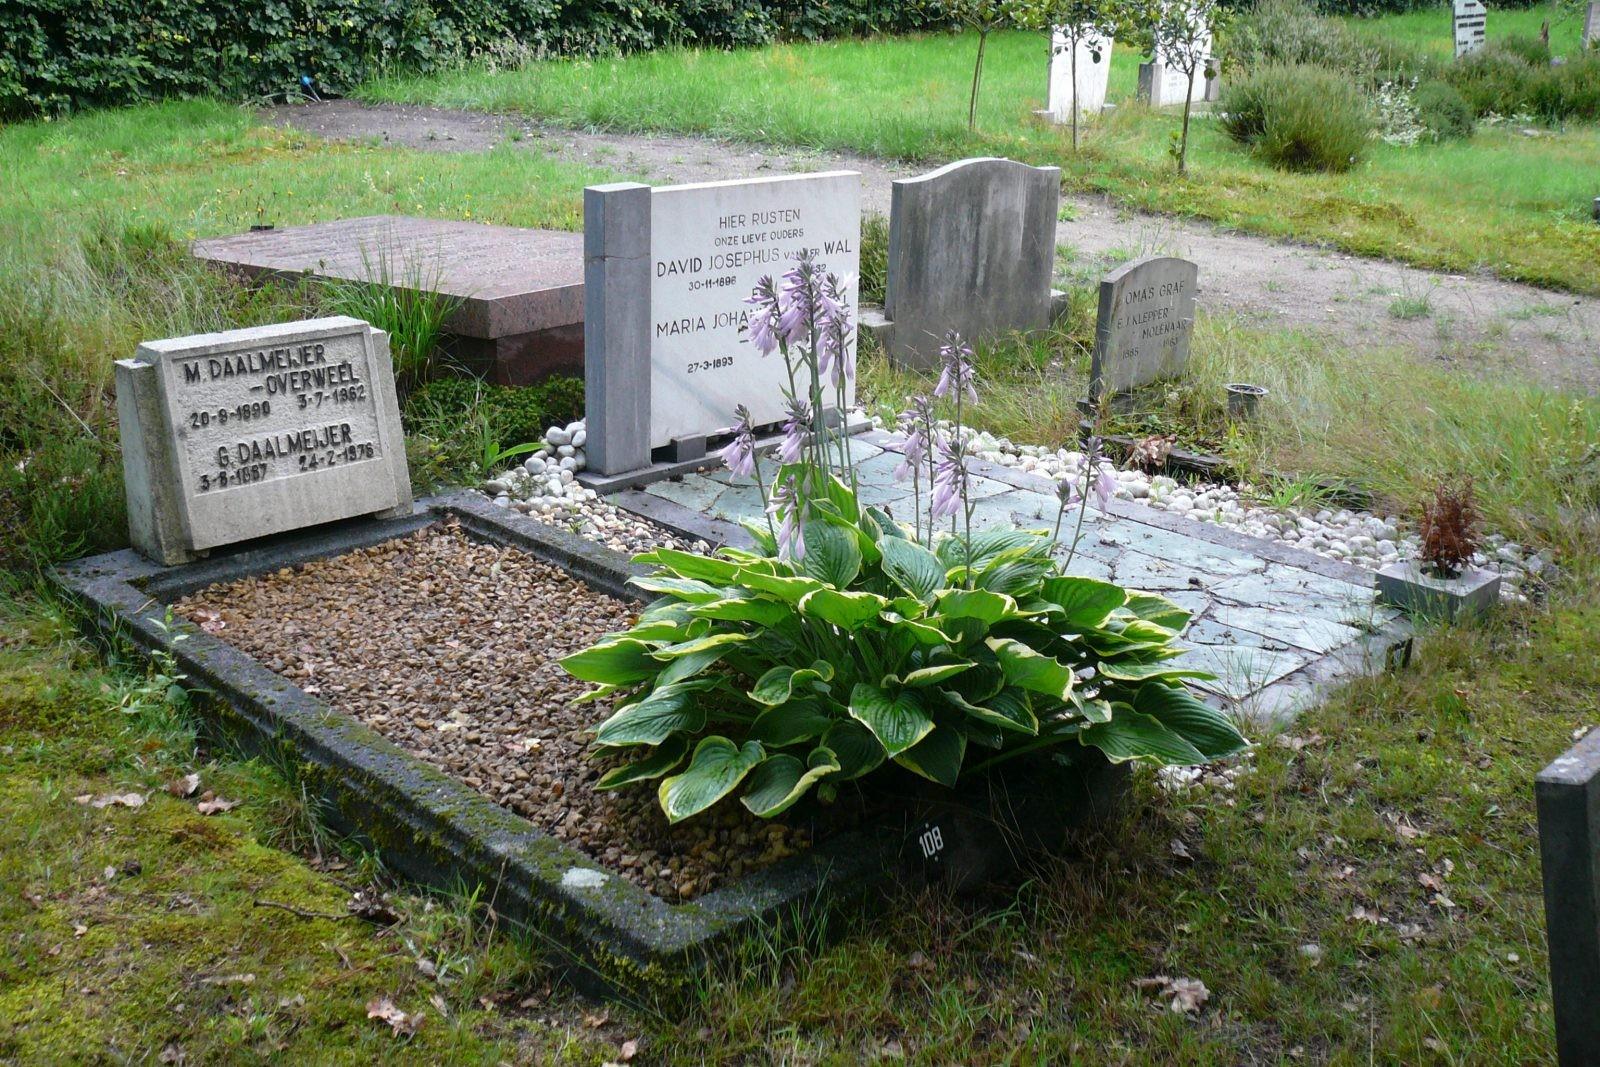 15-oude-graven-opgeknapt-juli-2008-e1573721037198